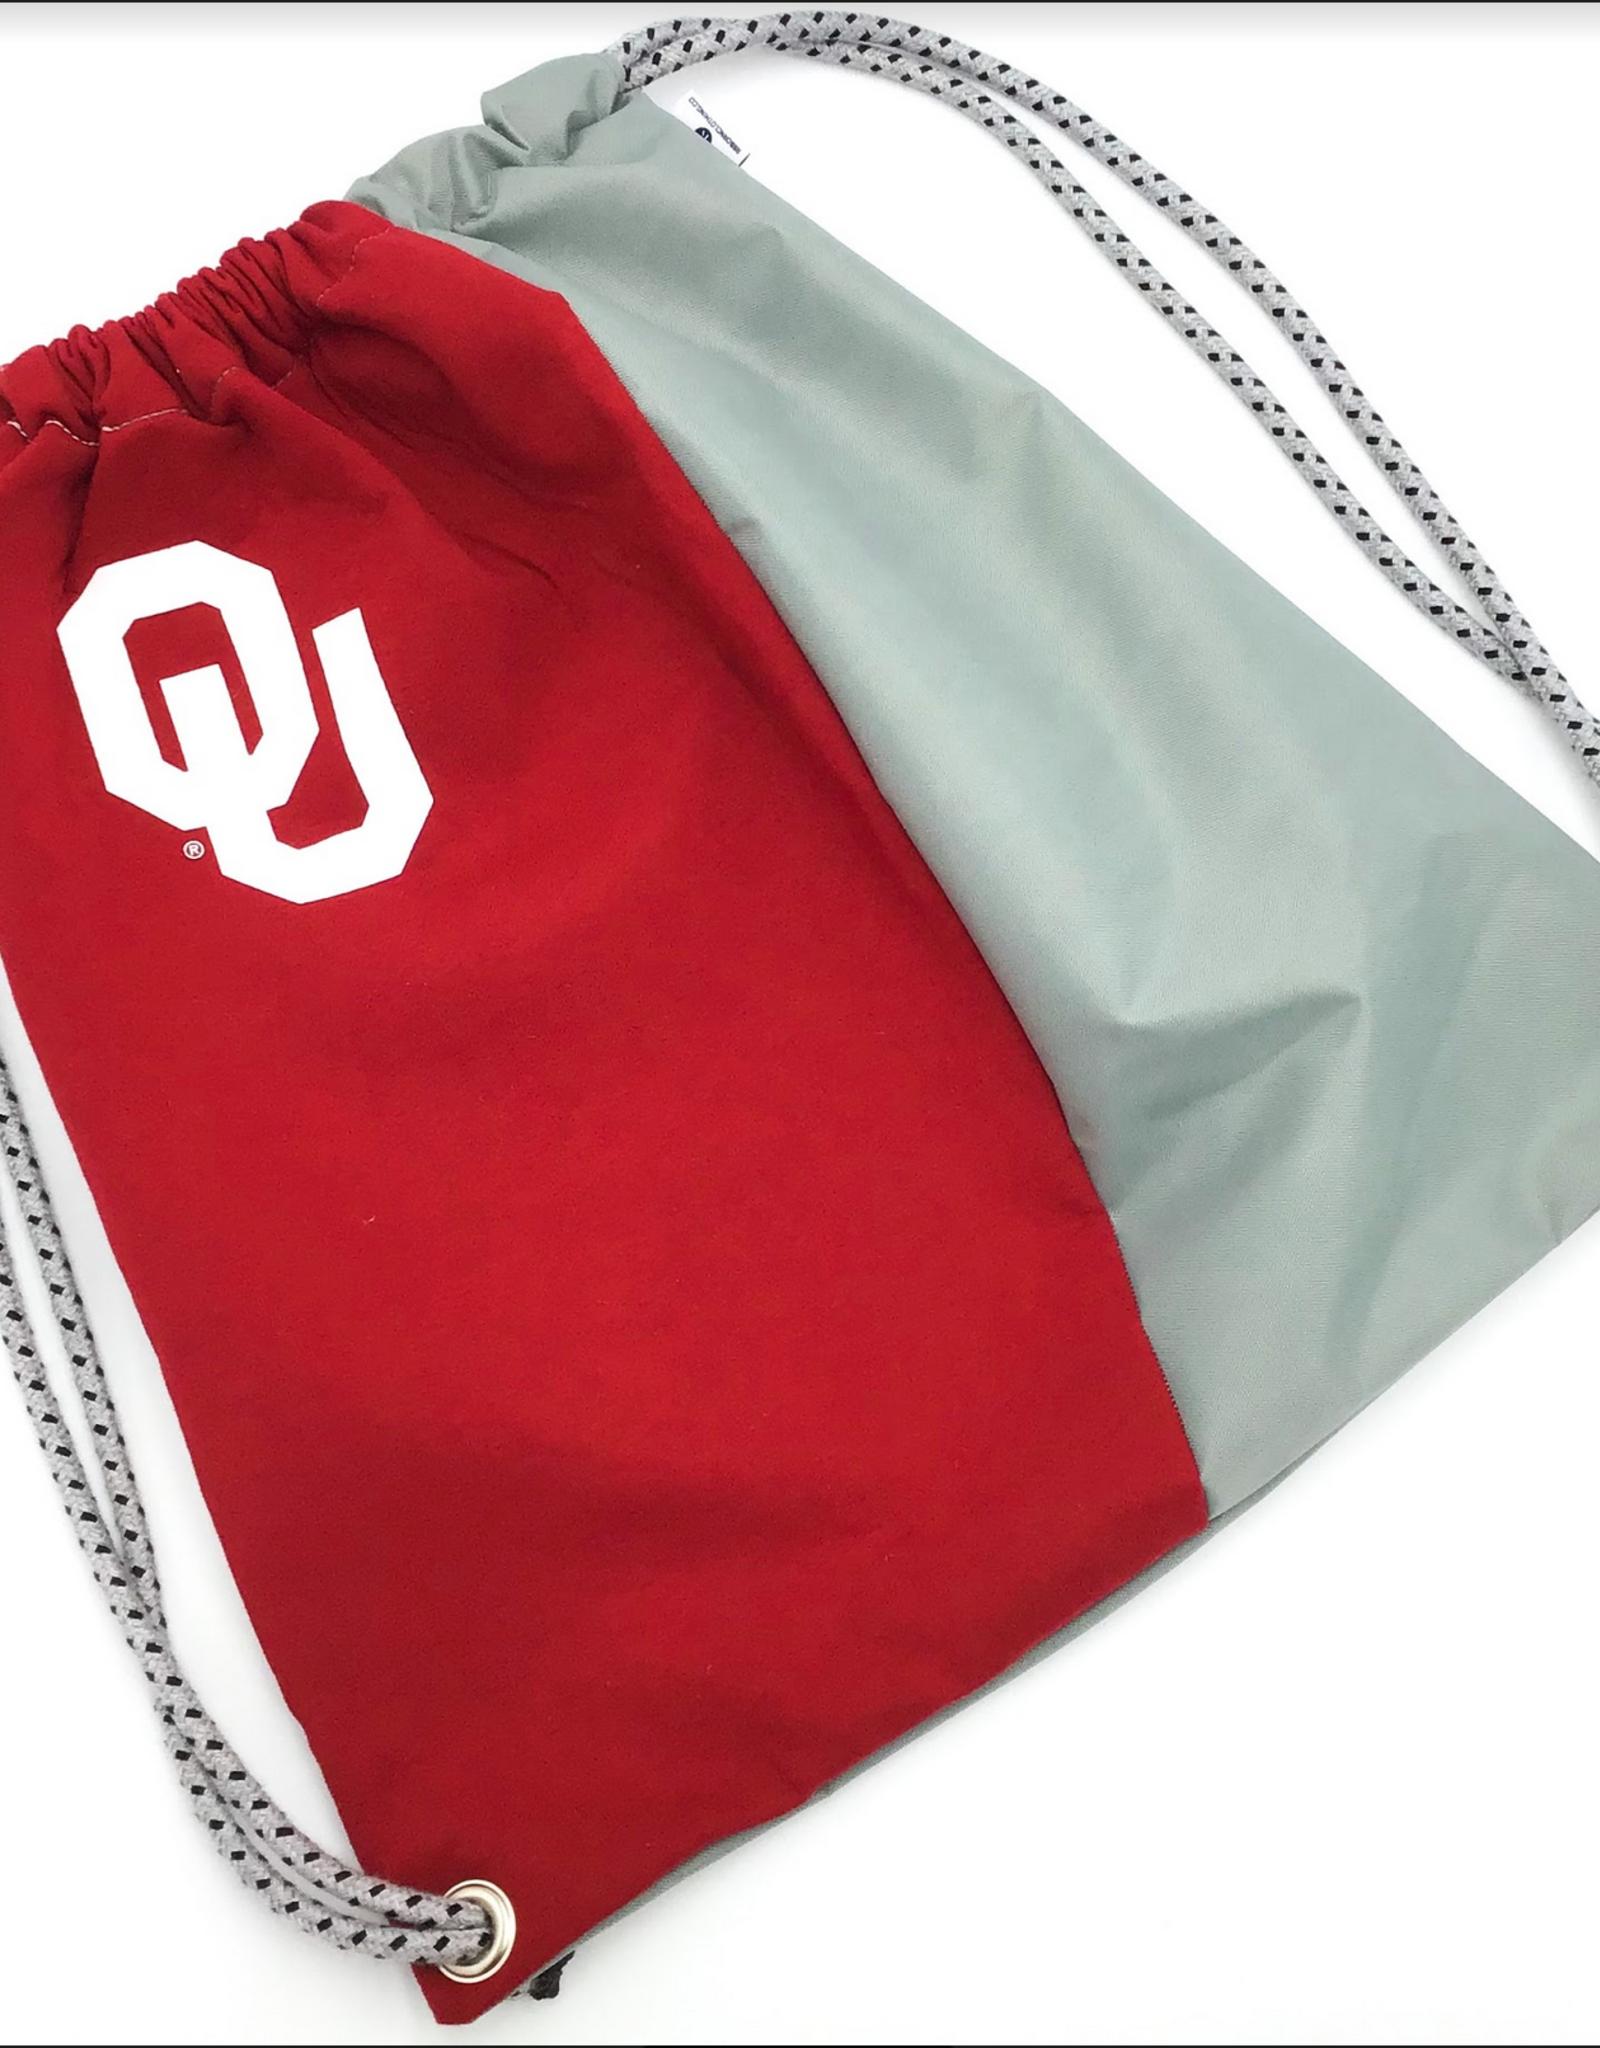 Reborn Reborn OU Recycled Clothing Cinch Bag